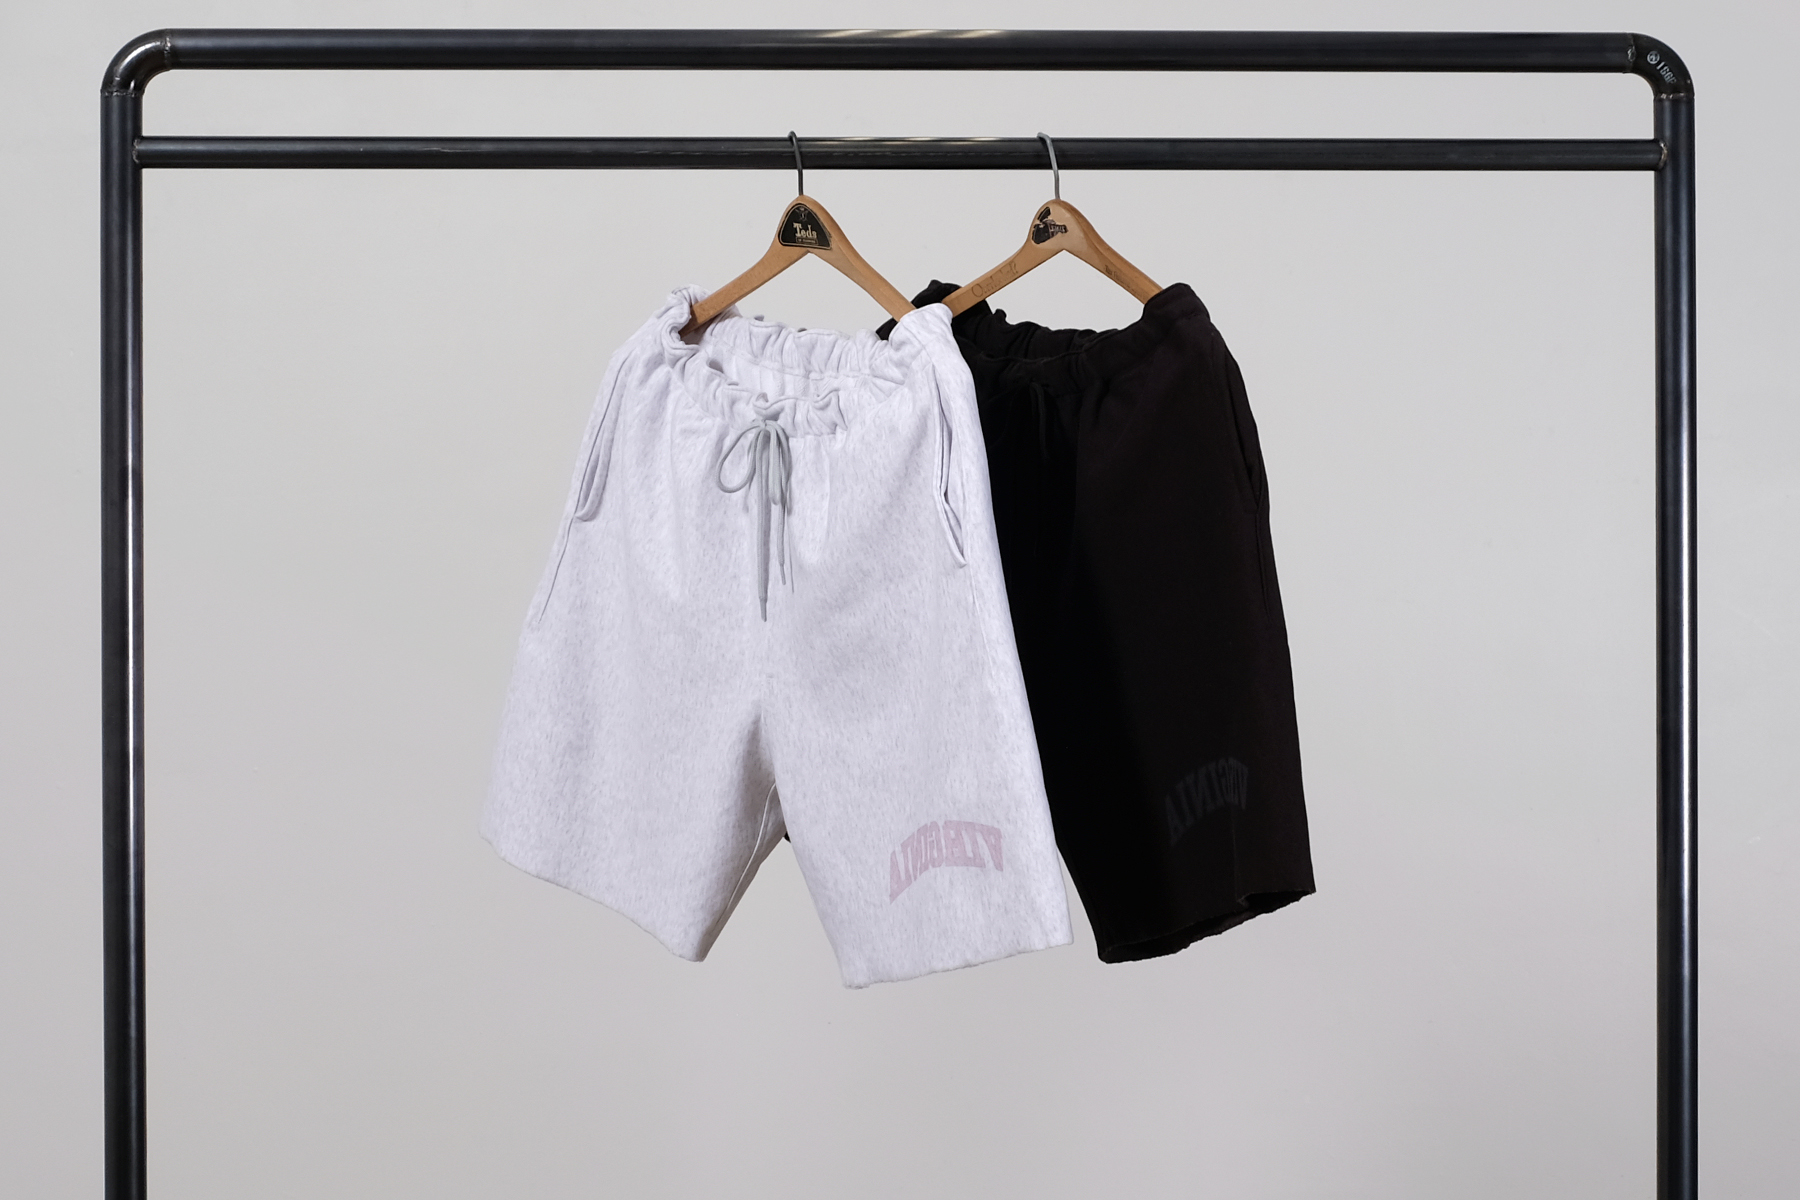 "blurhms|ブラームス ""VIRGINIA"" Tee BIG & Soft & Hard Sweat Shorts ""VIRGINIA"" Print"